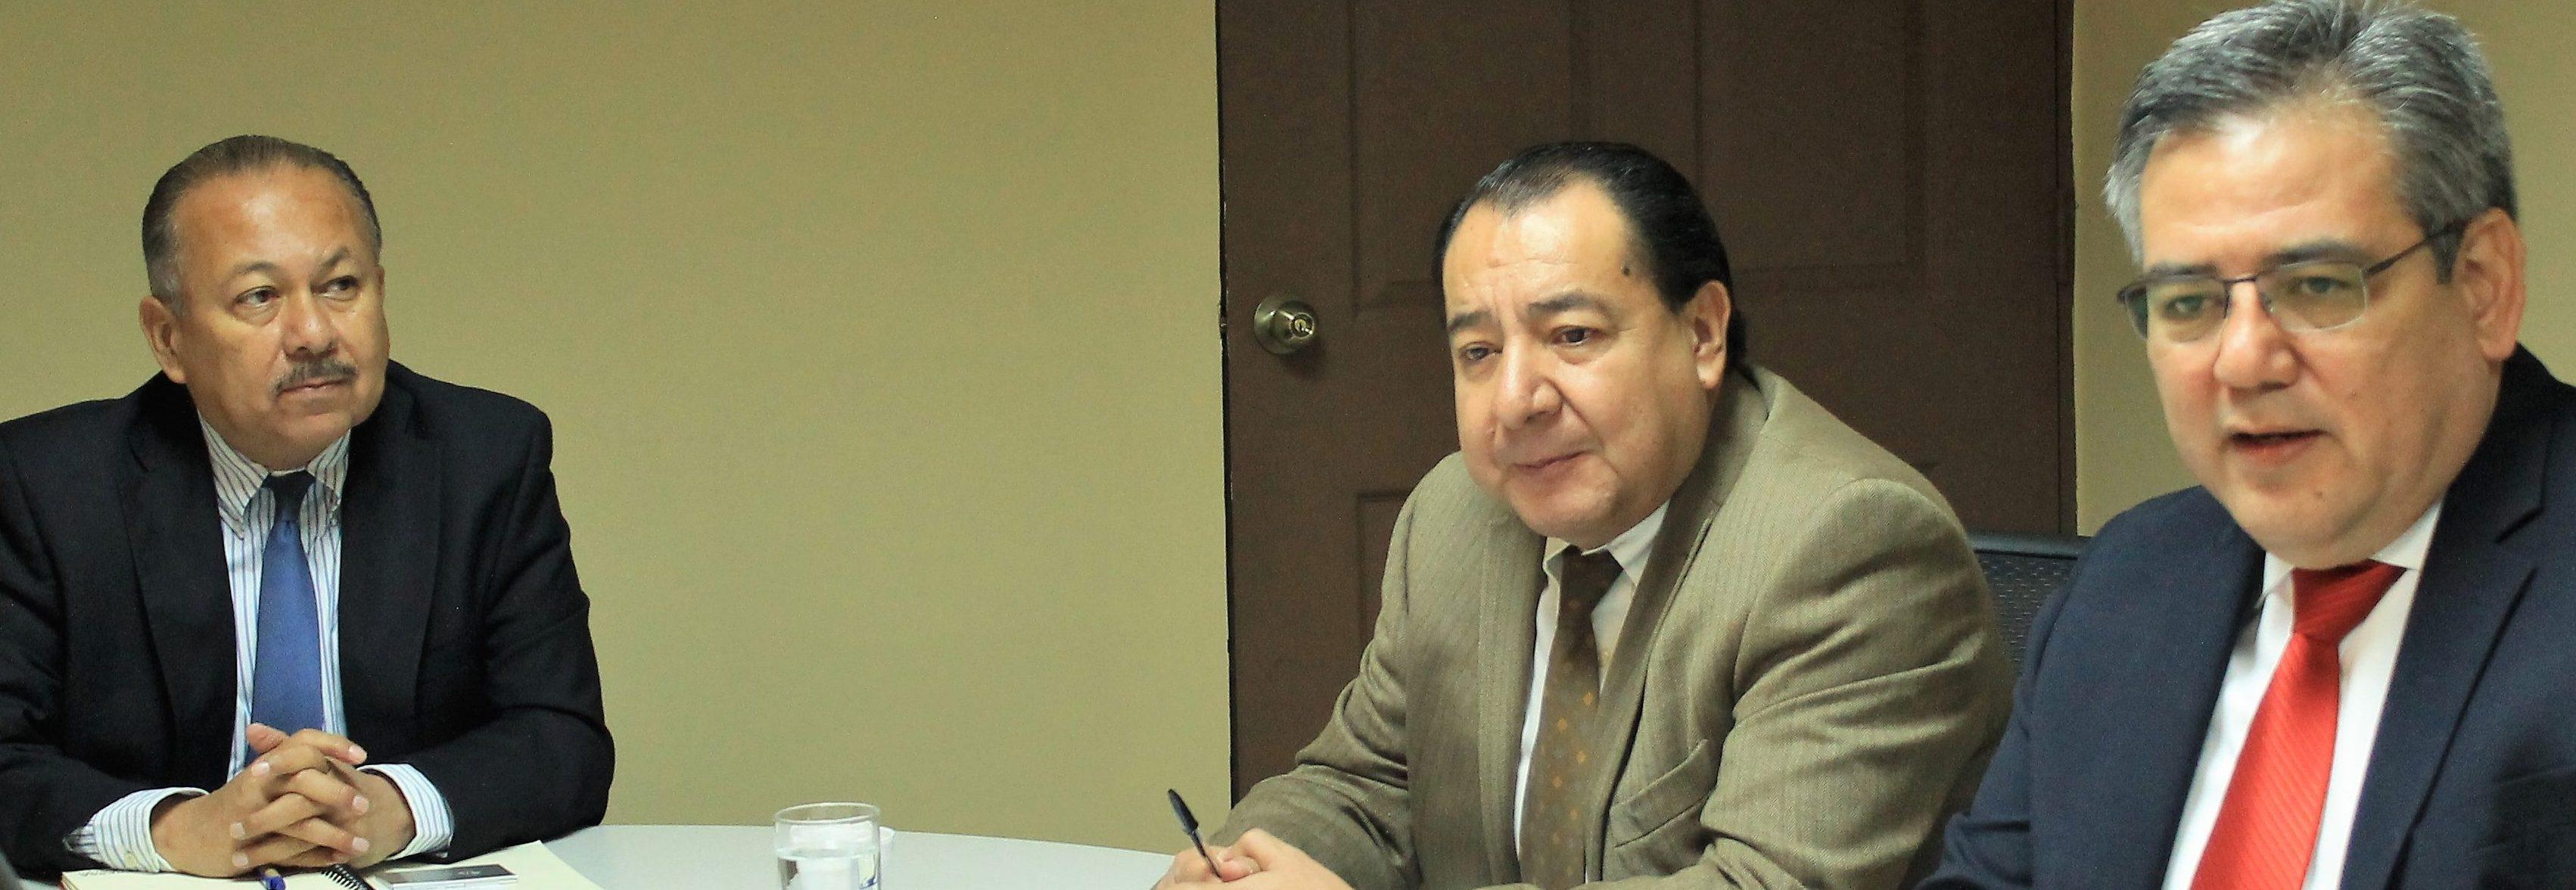 AEROLÍNEA MEXICANA PRÓXIMA A ABRIR OPERACIONES EN EL SALVADOR.